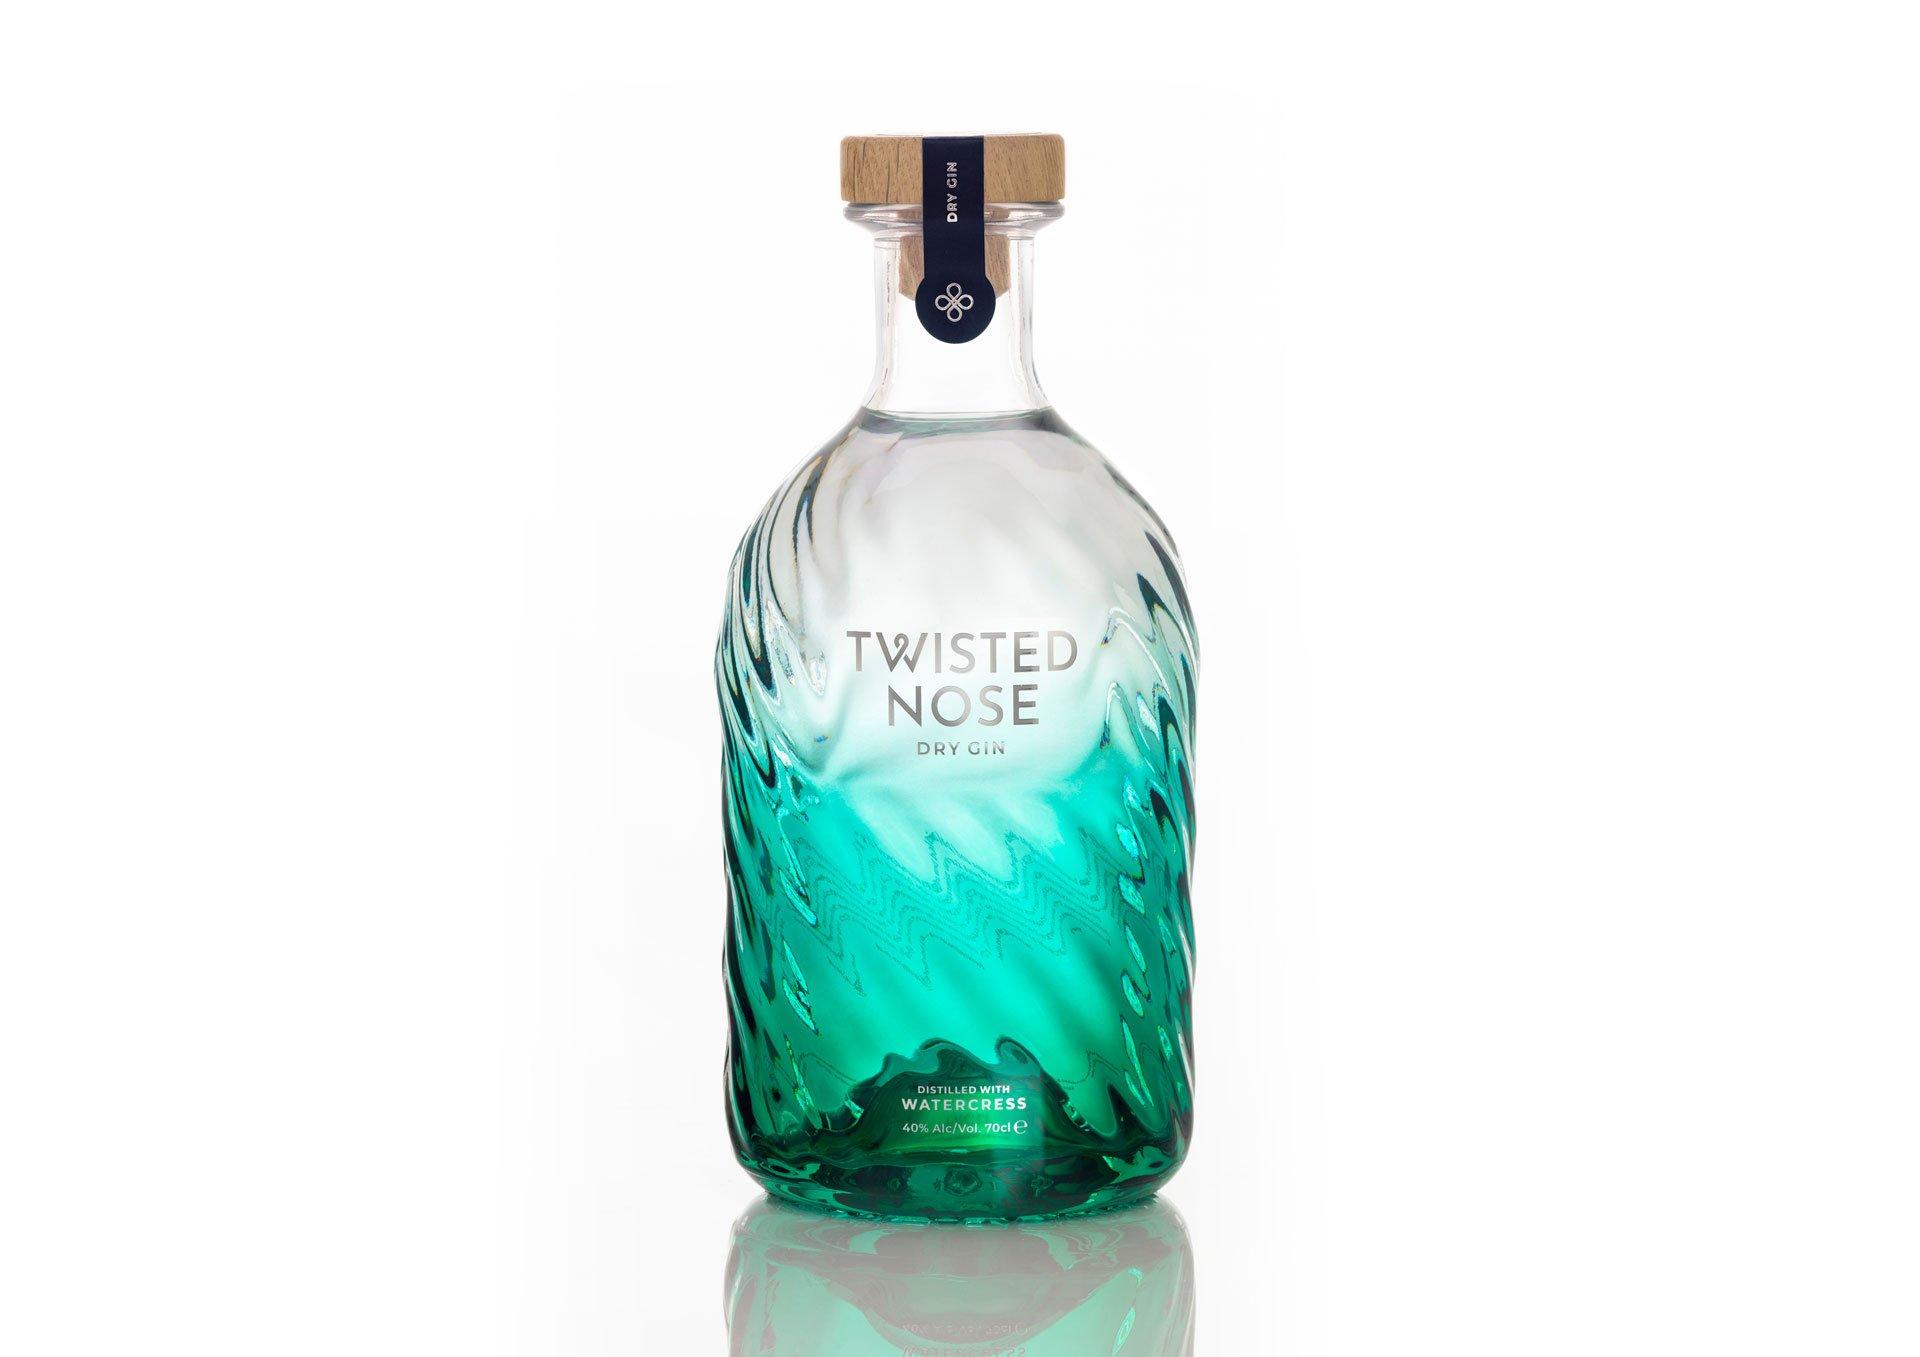 Beautiful gin bottle design